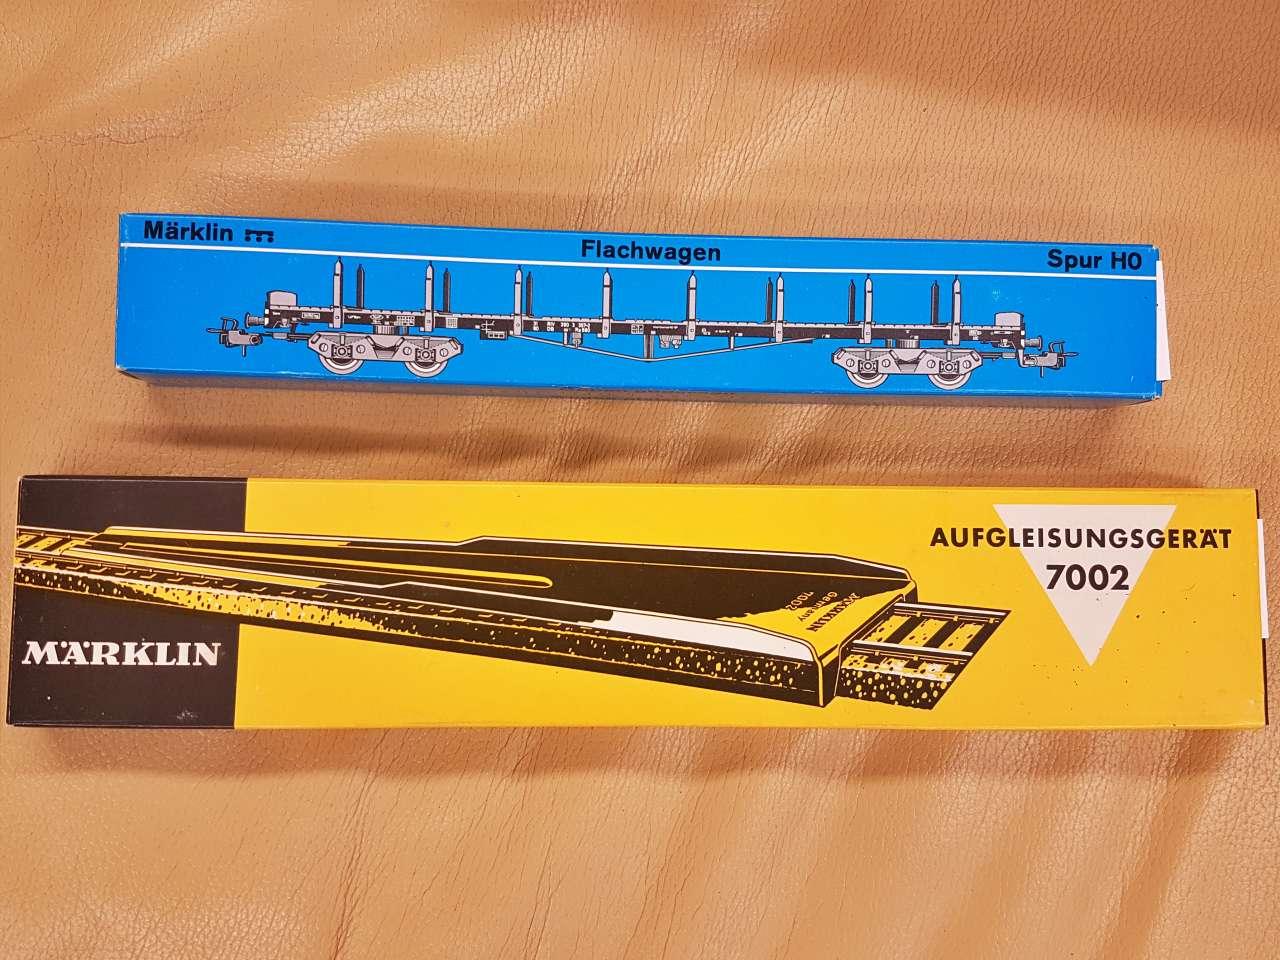 Märklin Modelleisenbahn Sammlerstücke neuwertig Gleisteile und Anhänger